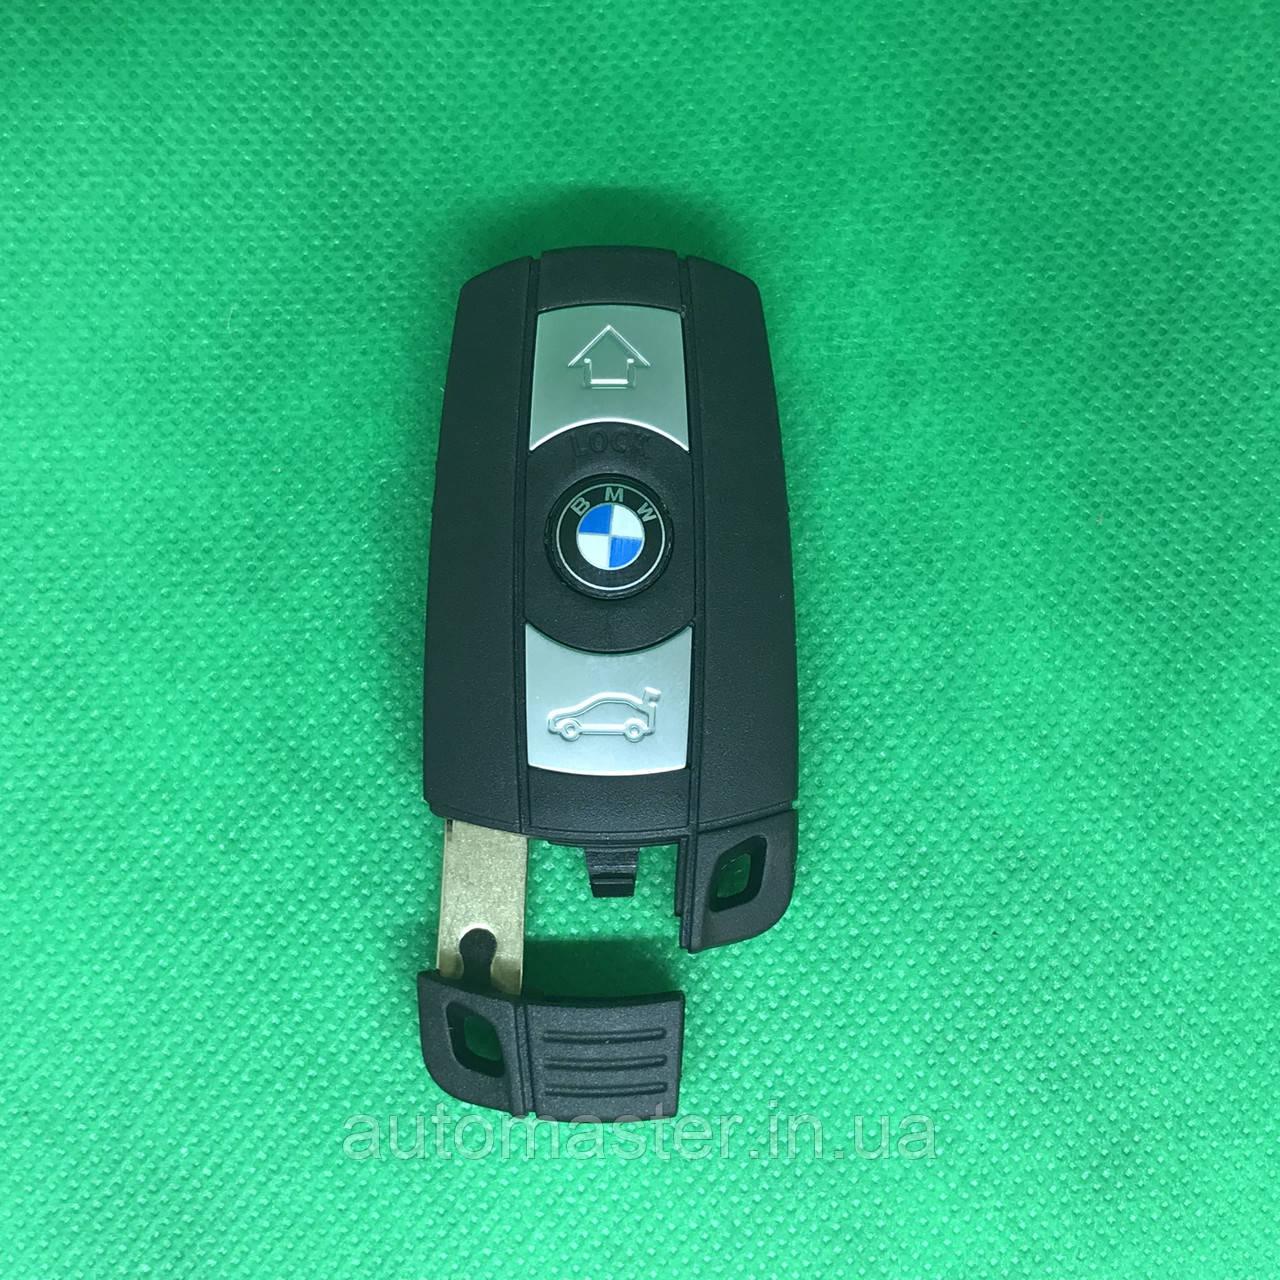 Корпус смарт ключа для BMW Е60, Е65, Е70, Е87, Е90, Х1, Х5, Х6 (БМВ) 3 - кнопки